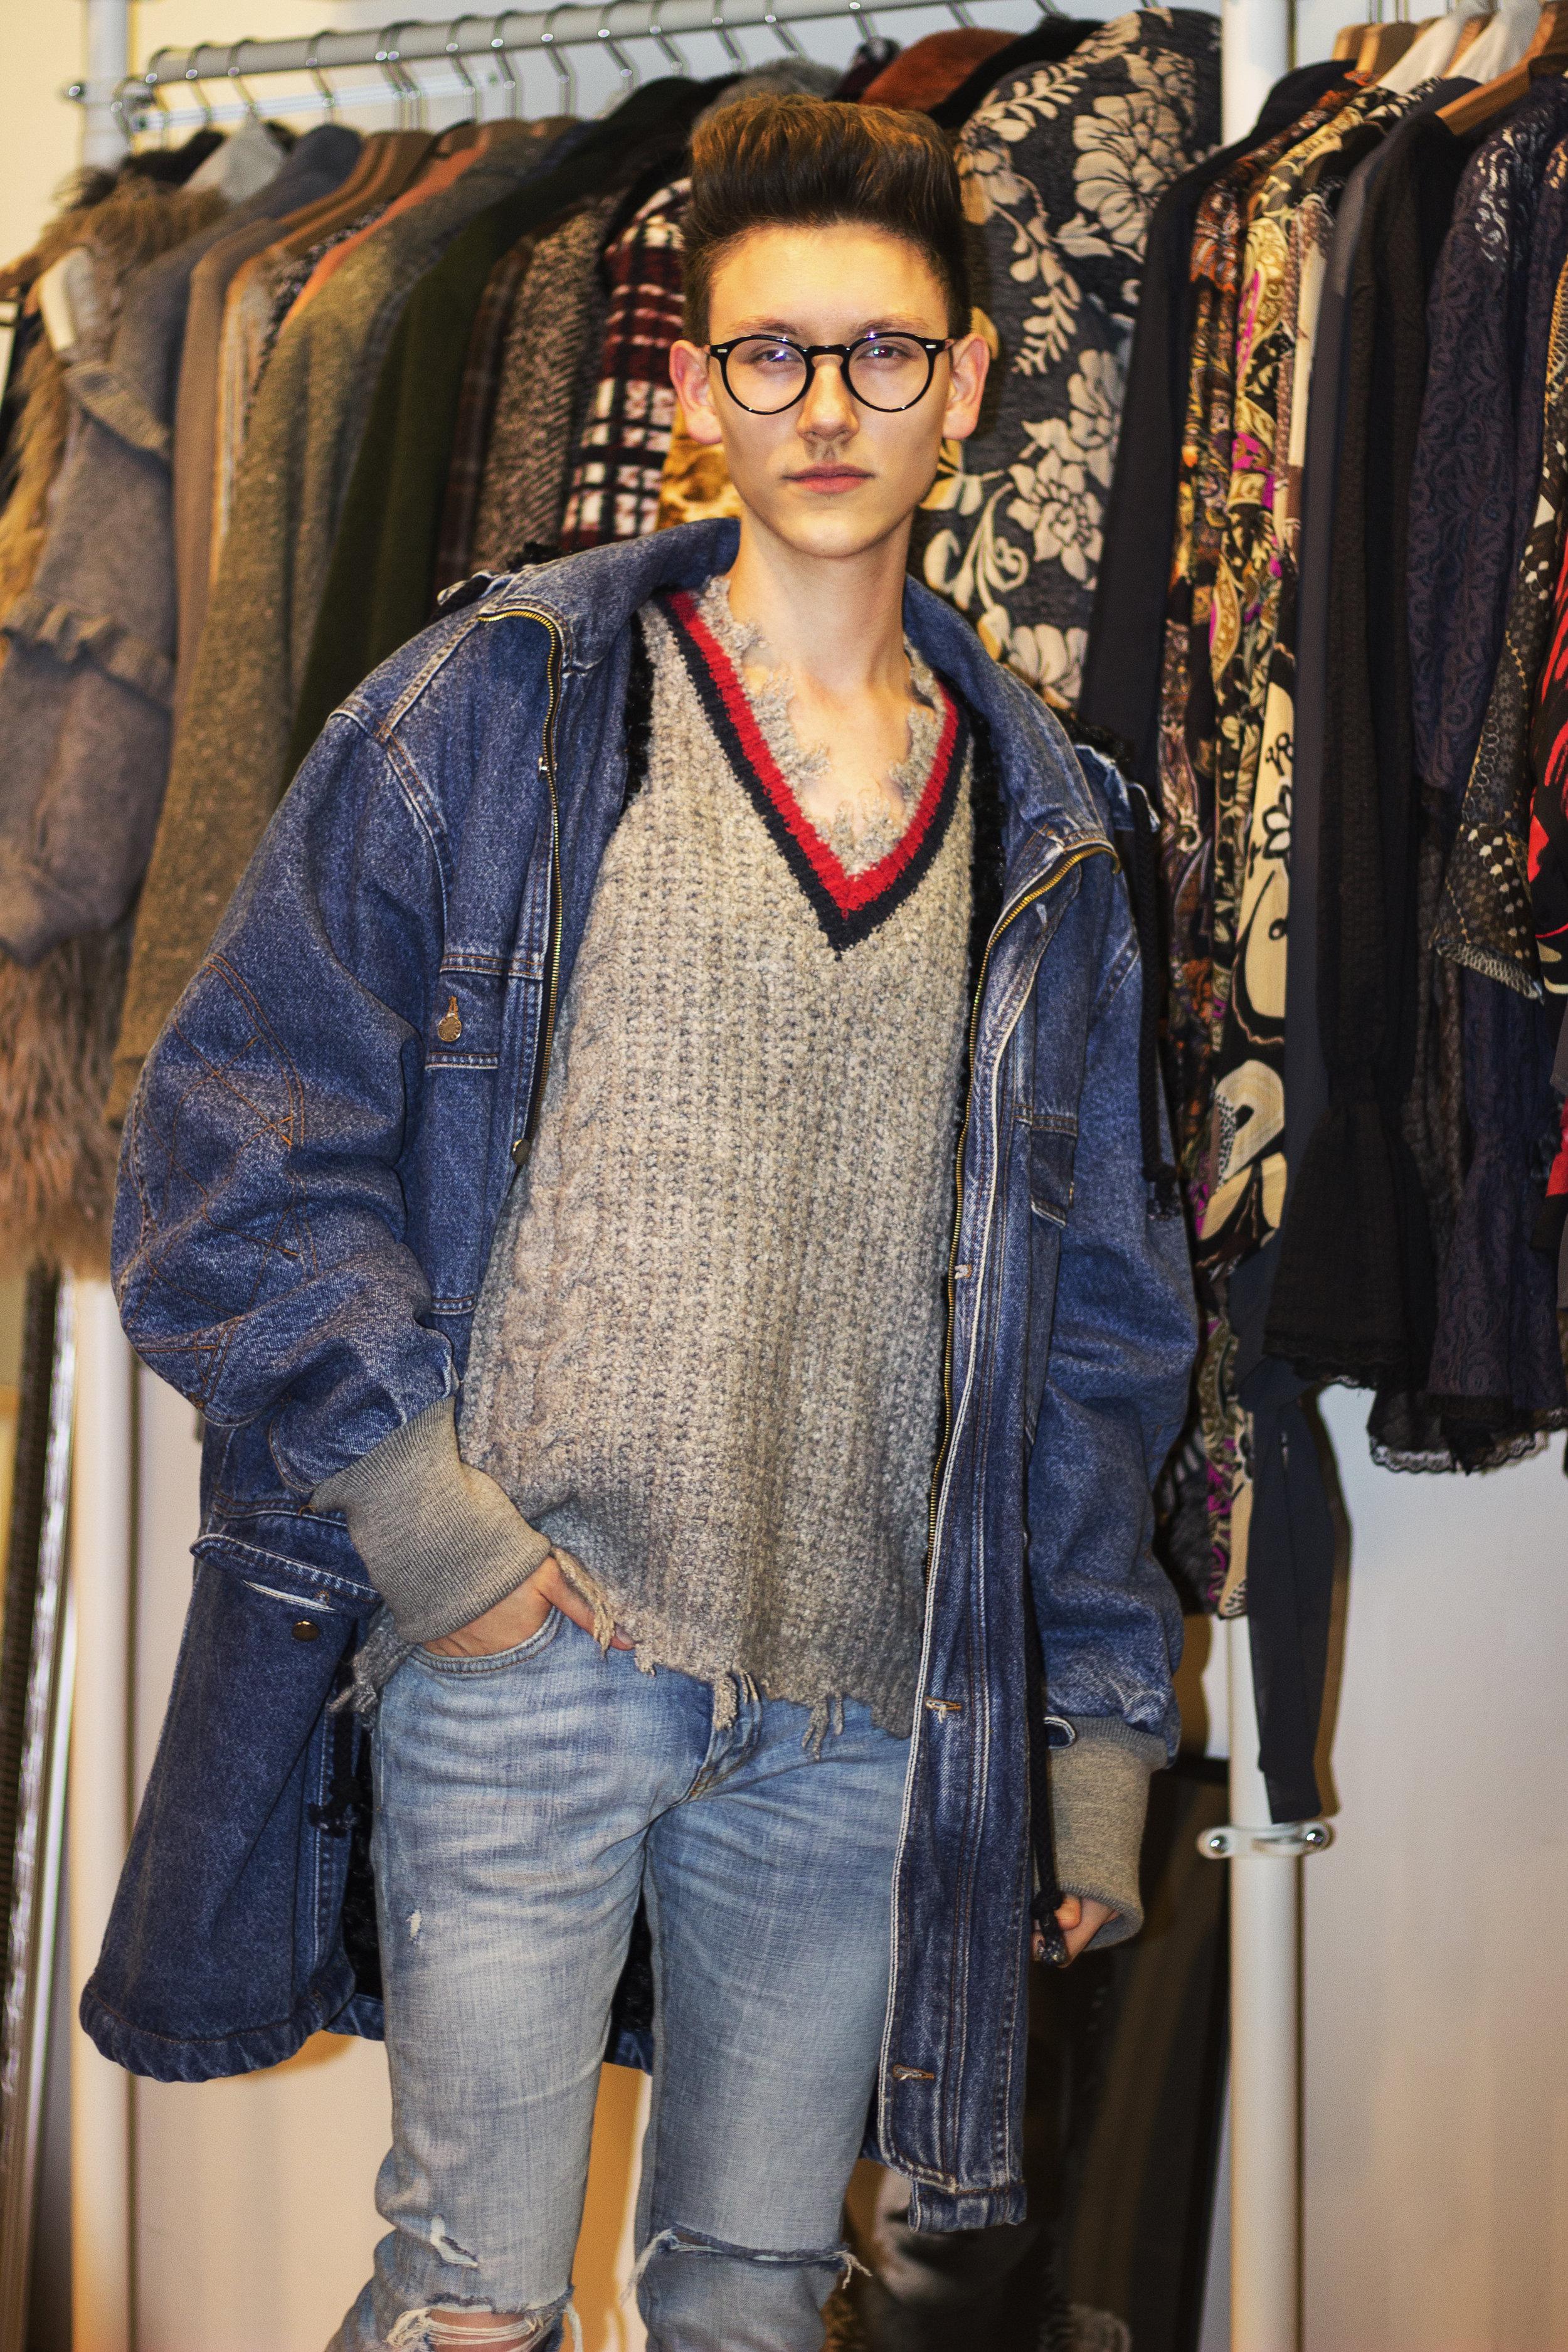 robert-sever-kristina-showroom-croatian-designer-expensive-reality-bipa-fashion-hr (2).jpg